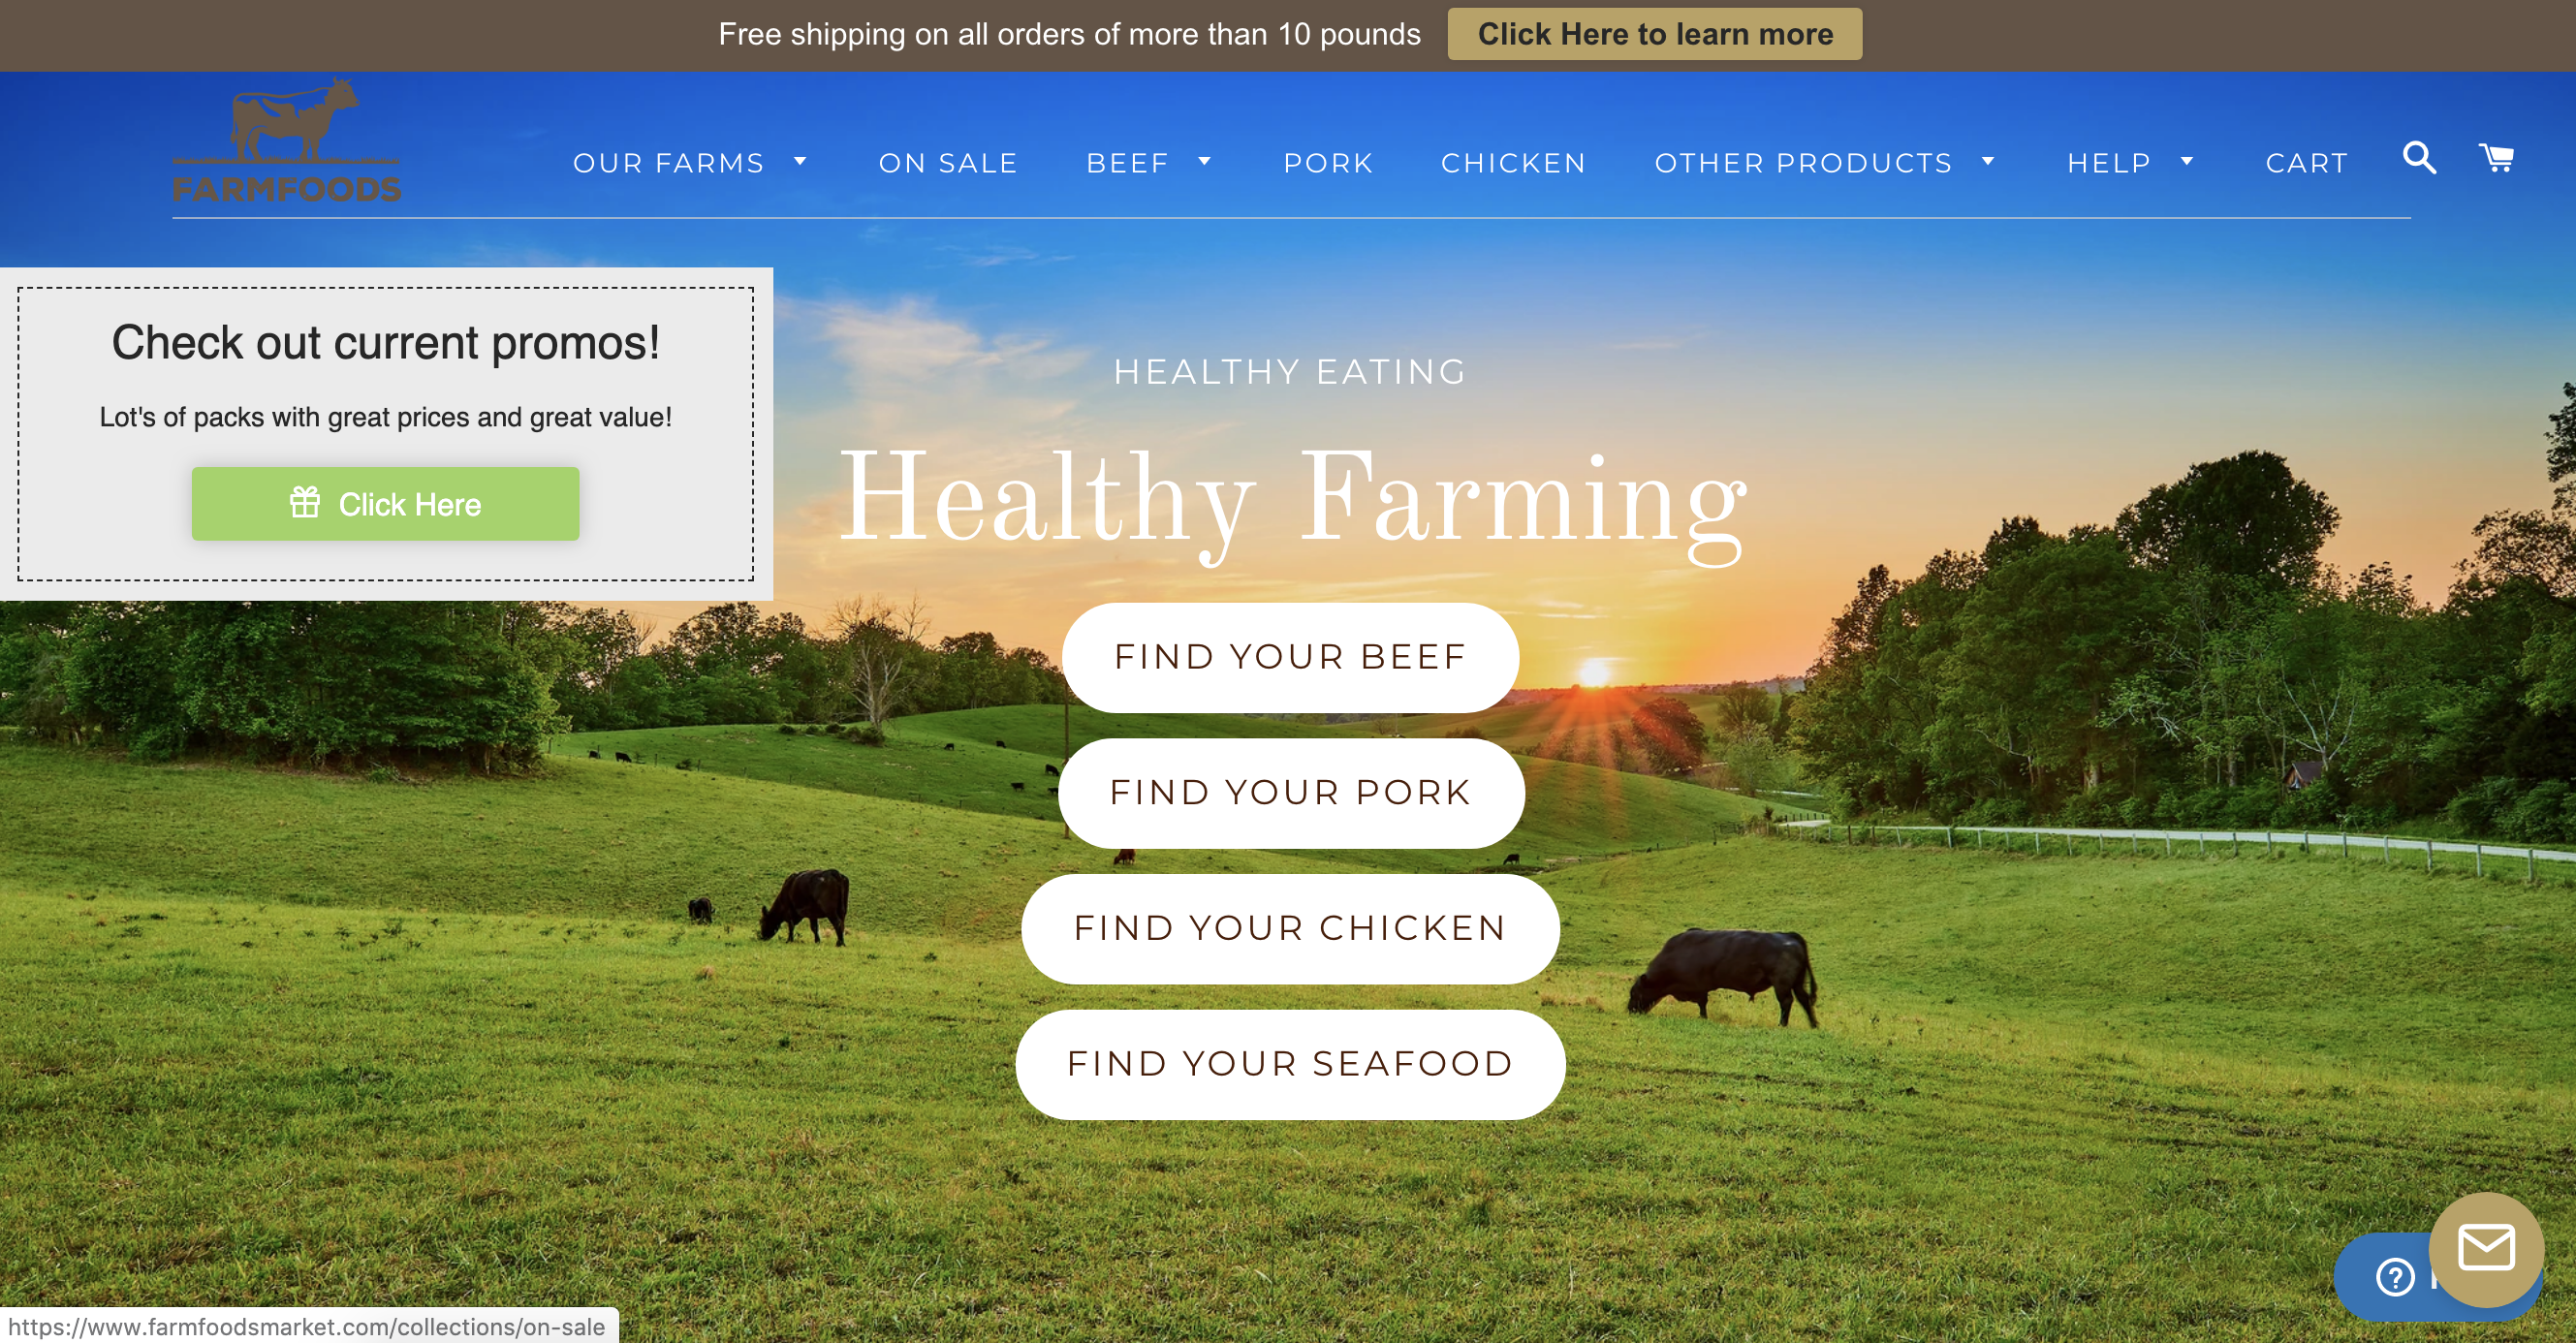 FarmFoods meats